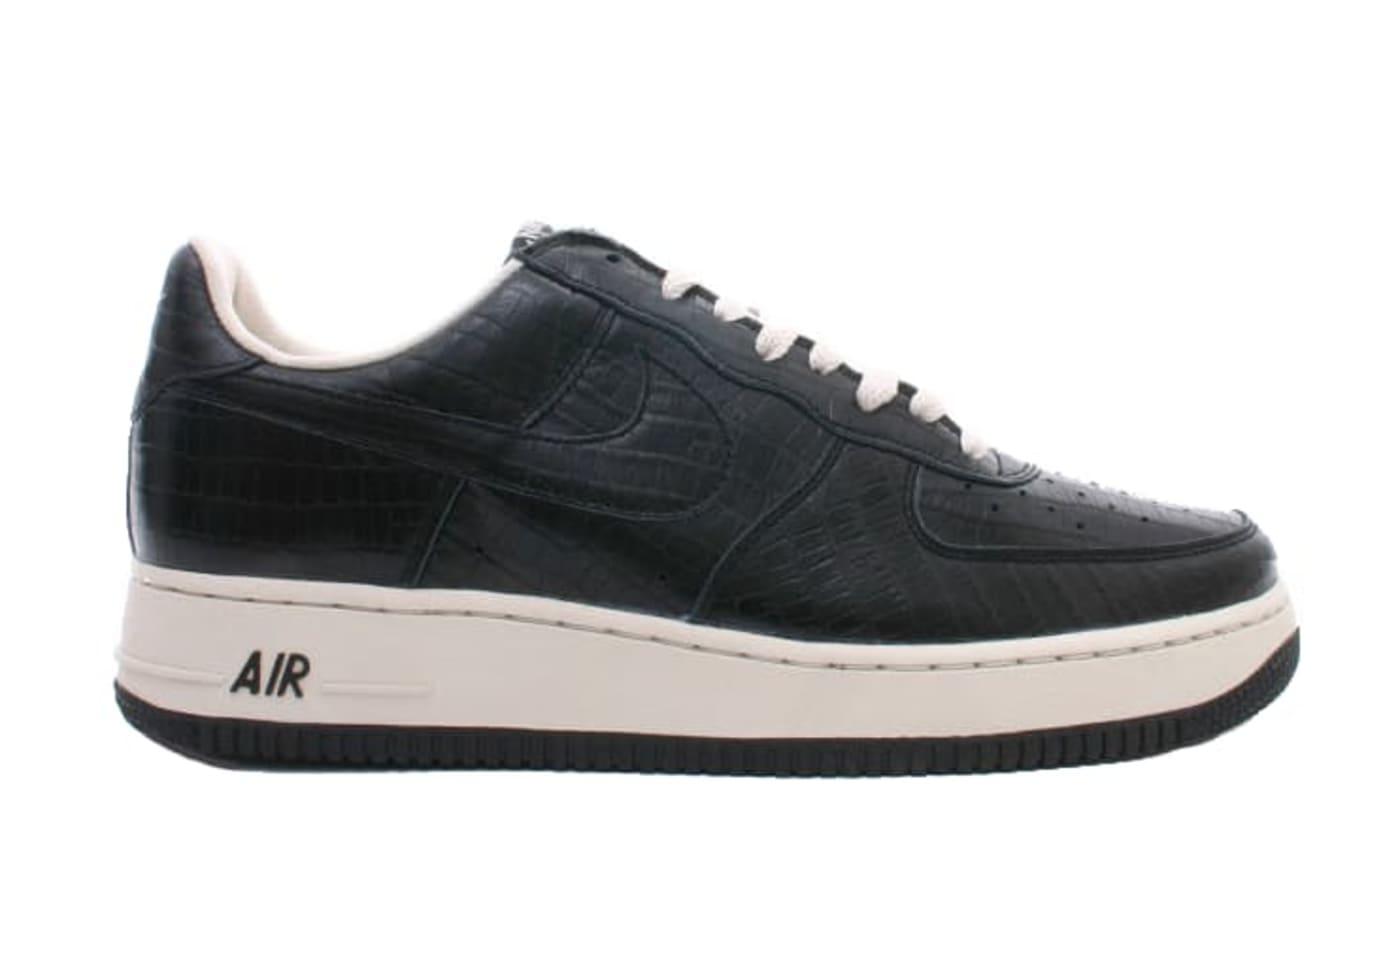 Nike Air Force 1 HTM